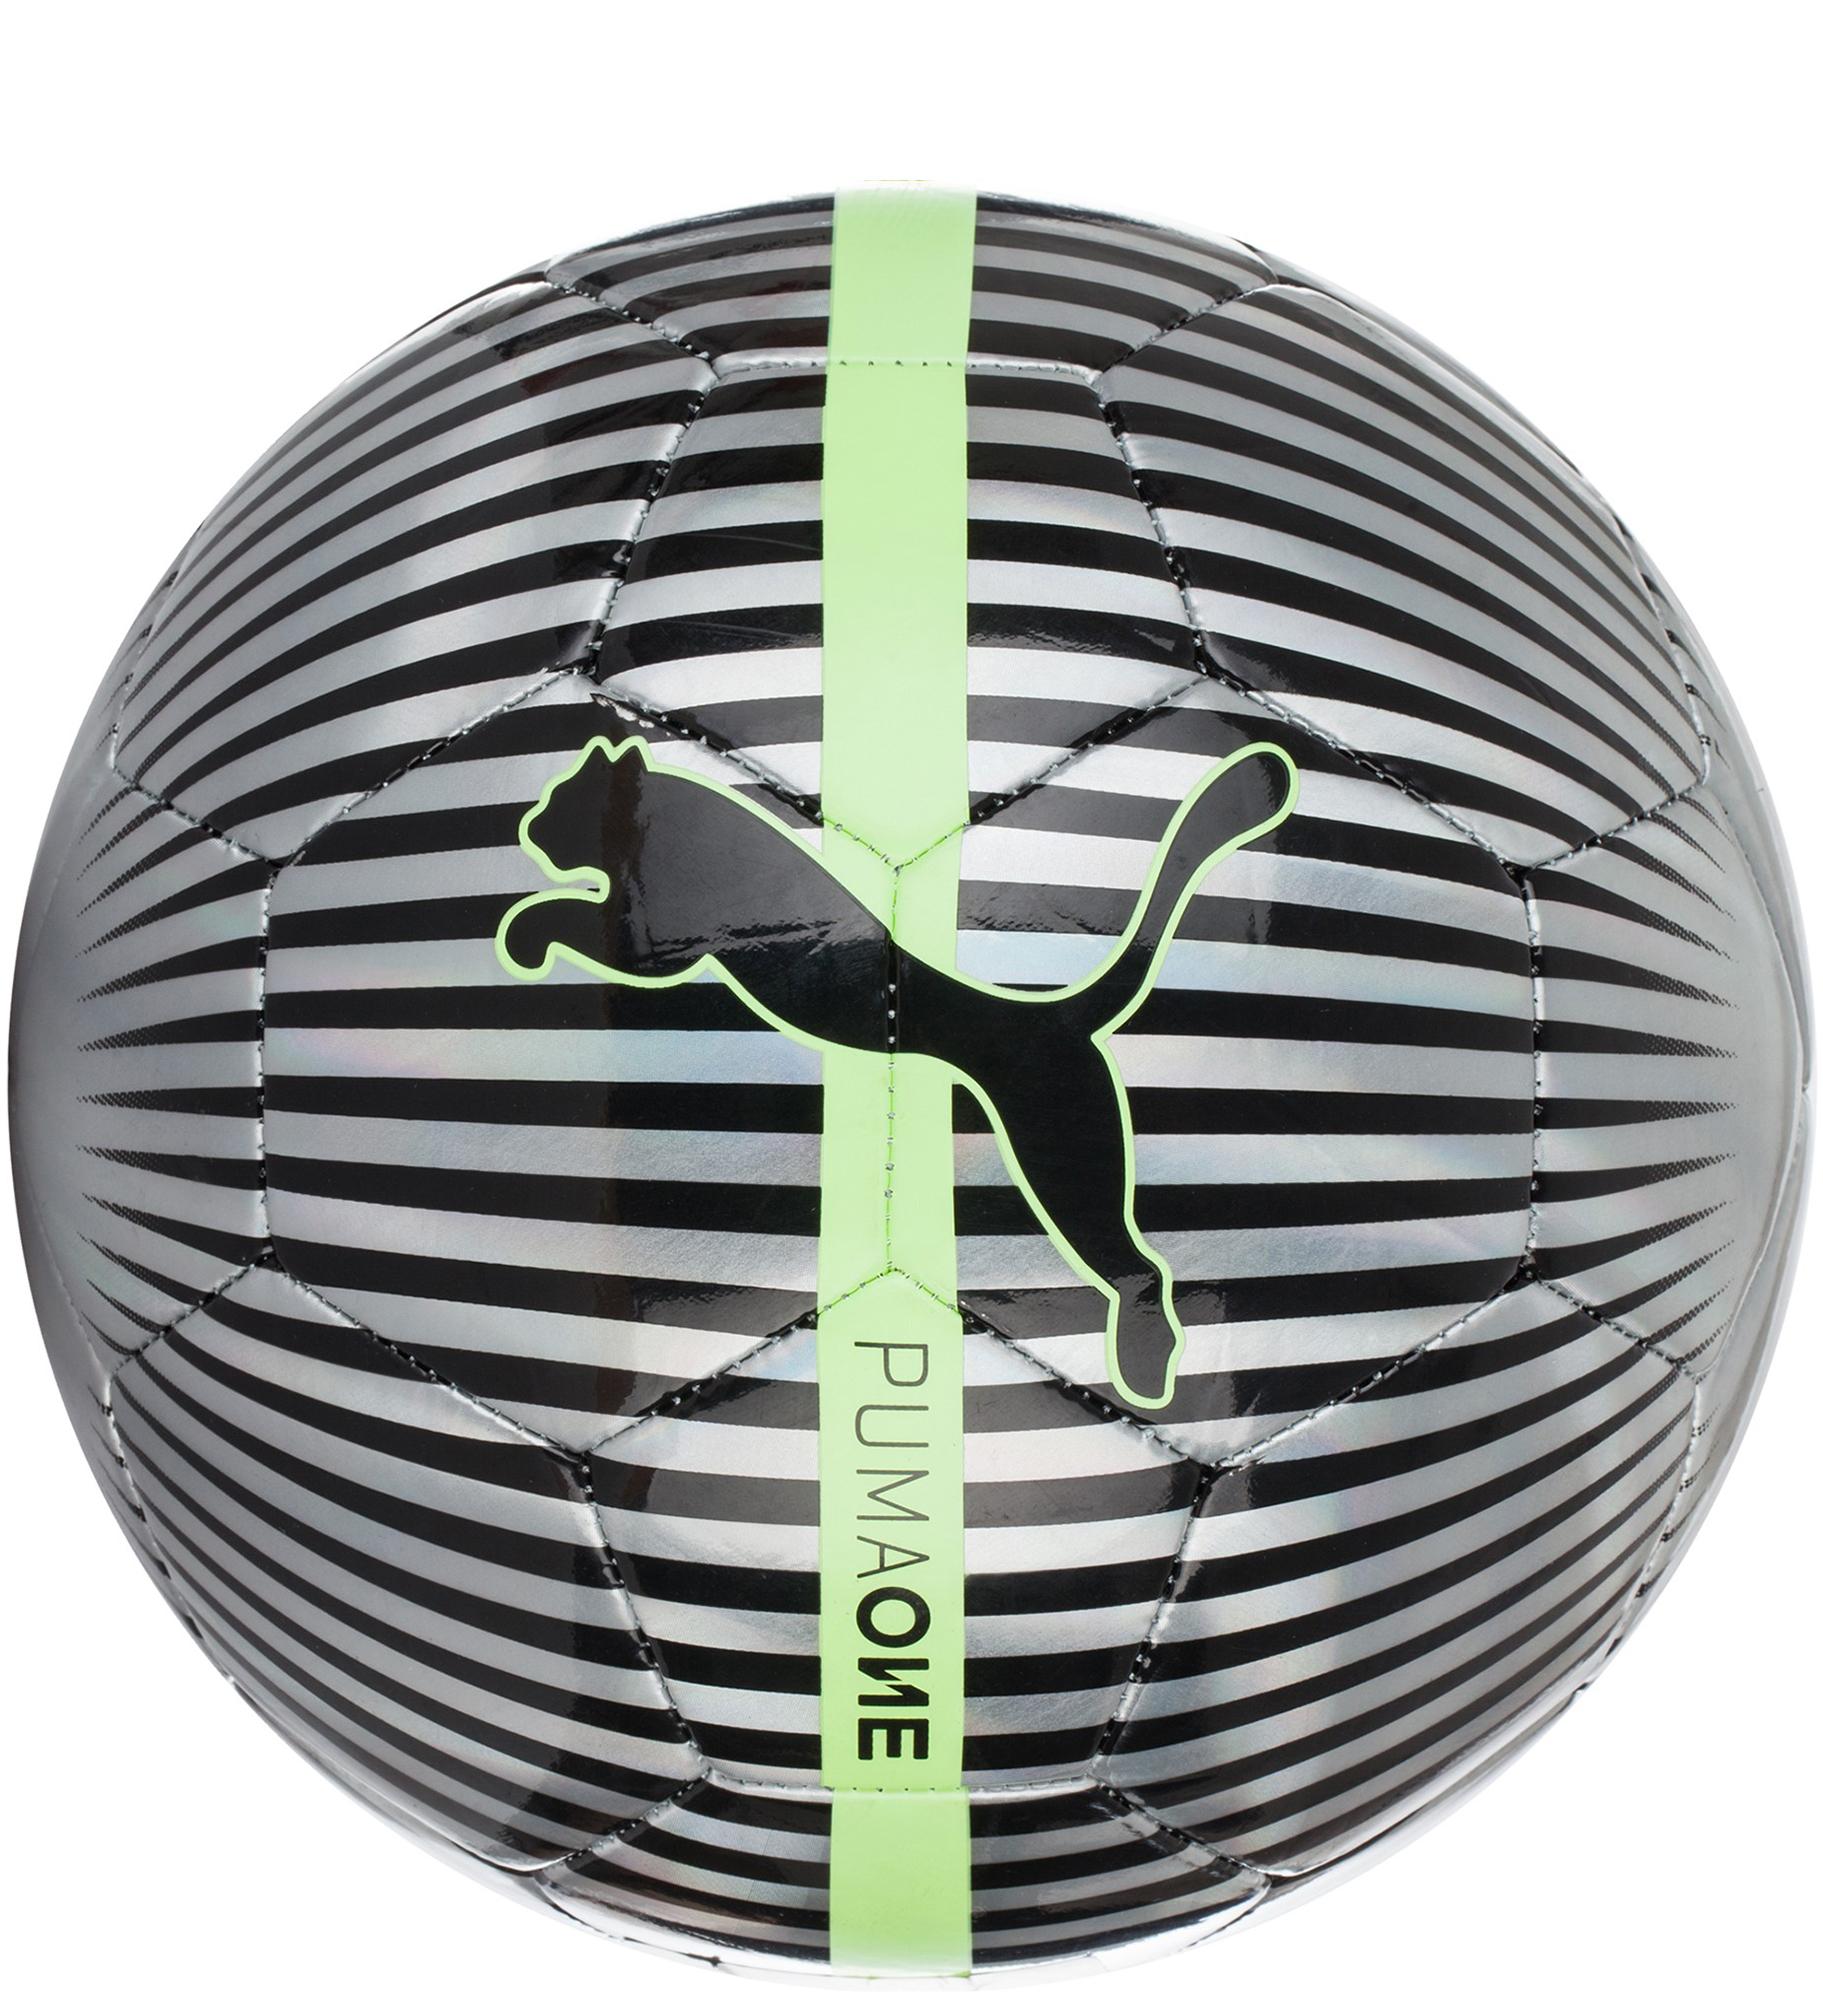 Puma Мяч футбольный Puma One Chrome, размер 5 puma puma evospeed 5 4 it